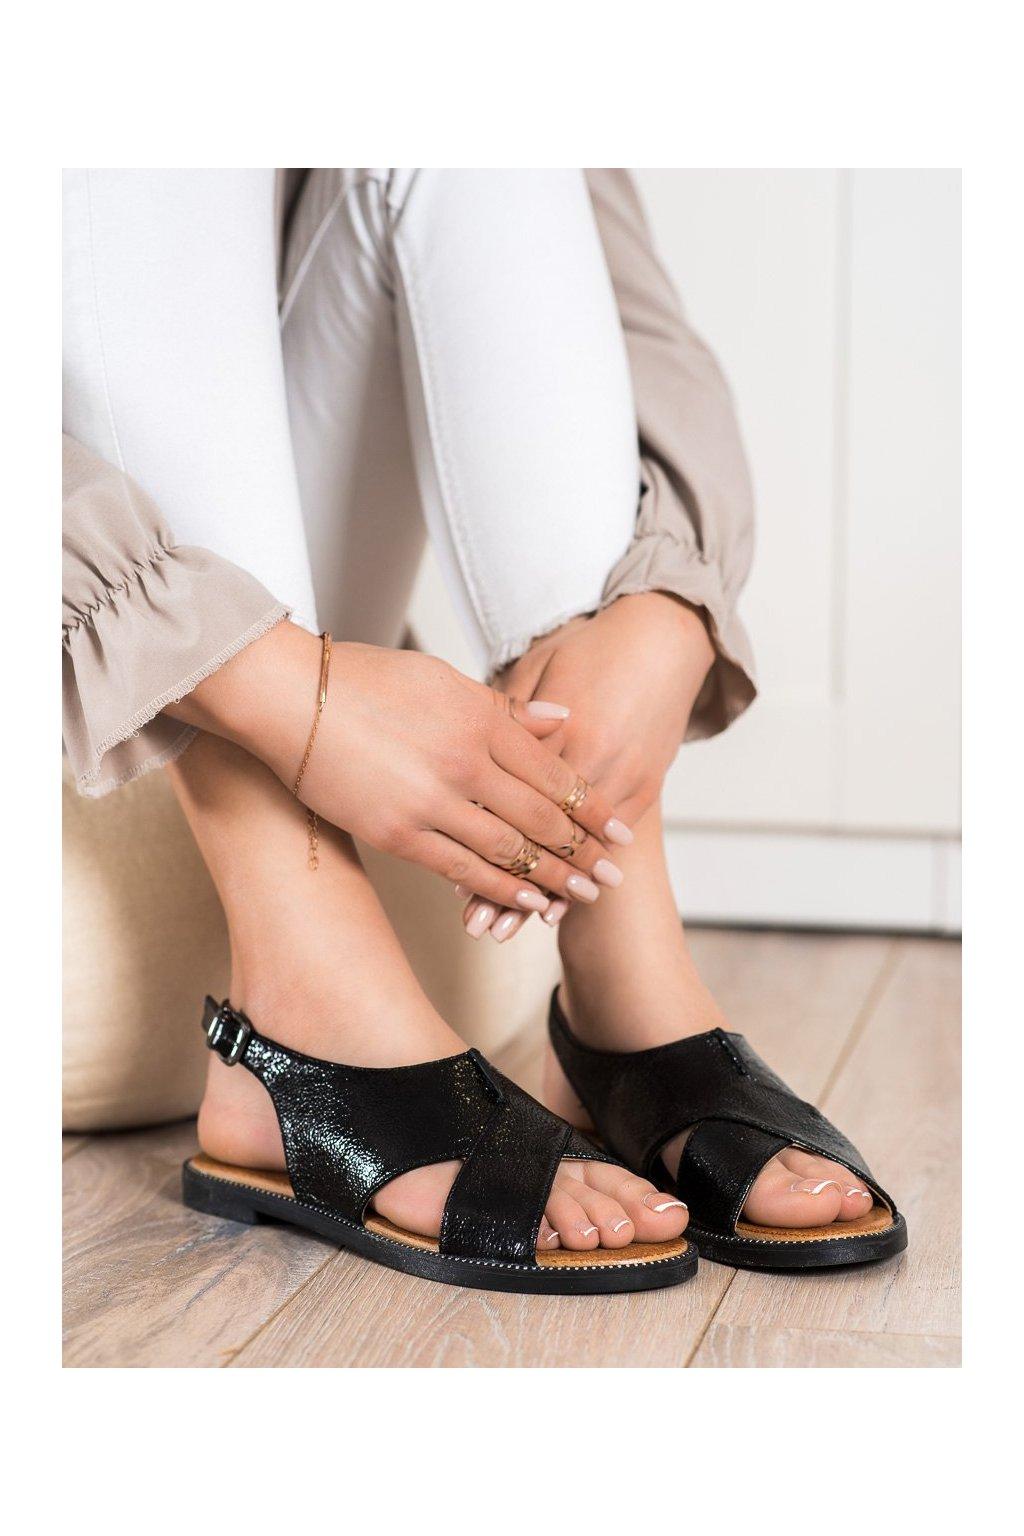 Čierne sandále Filippo kod DS2104/21B